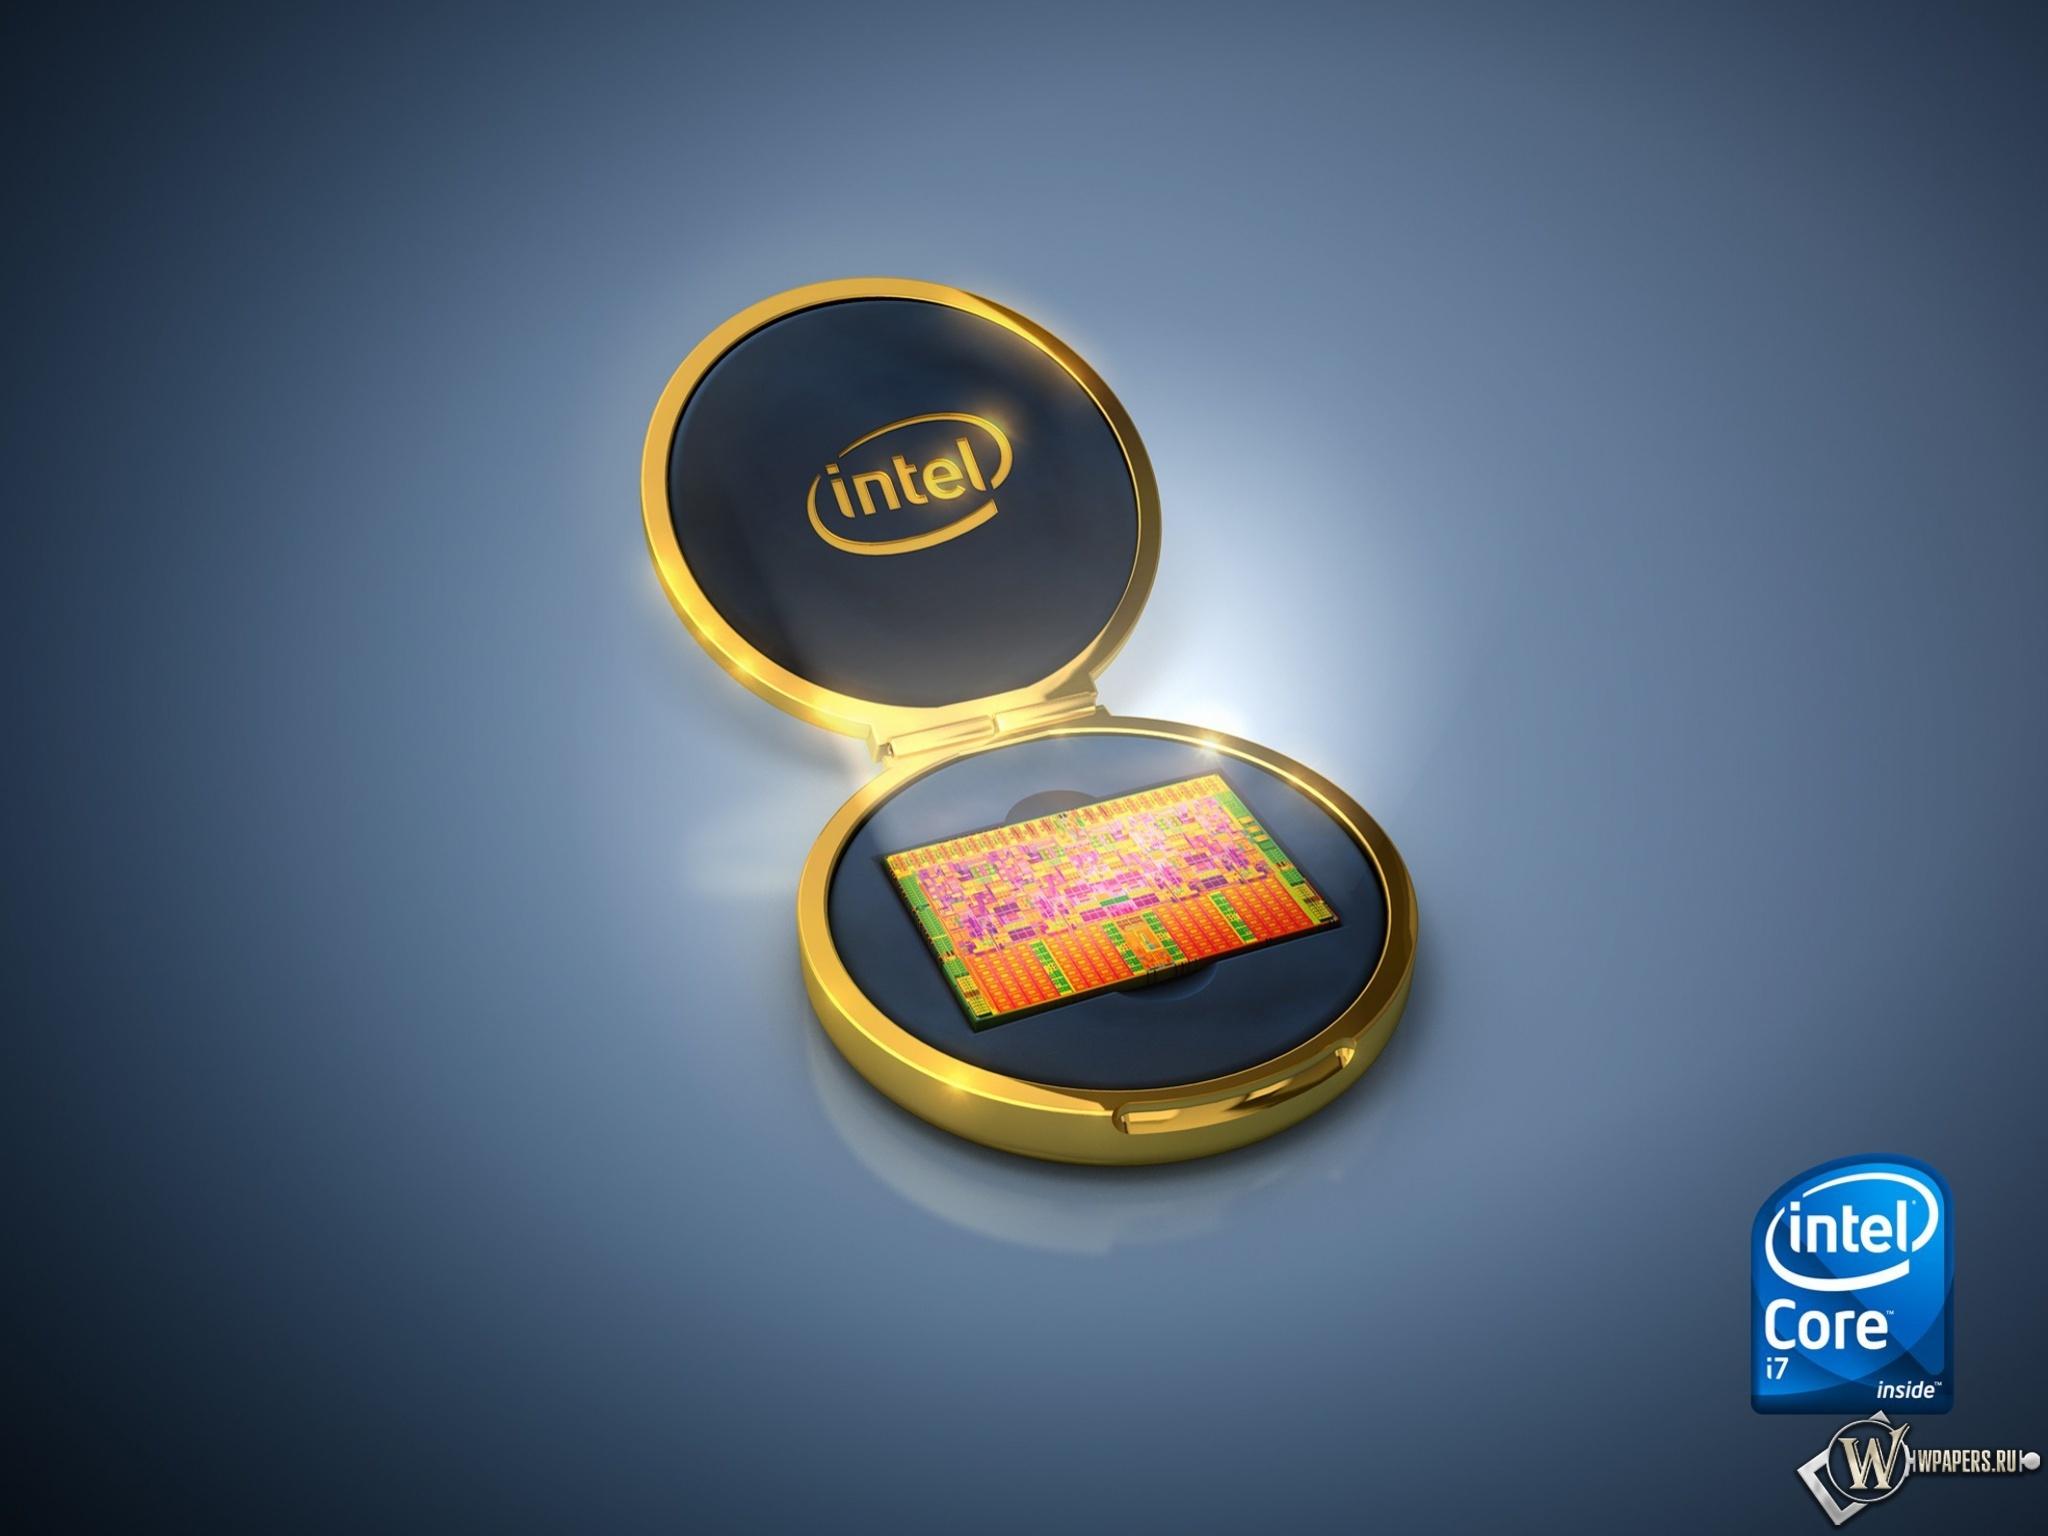 Intel Core i7 2048x1536